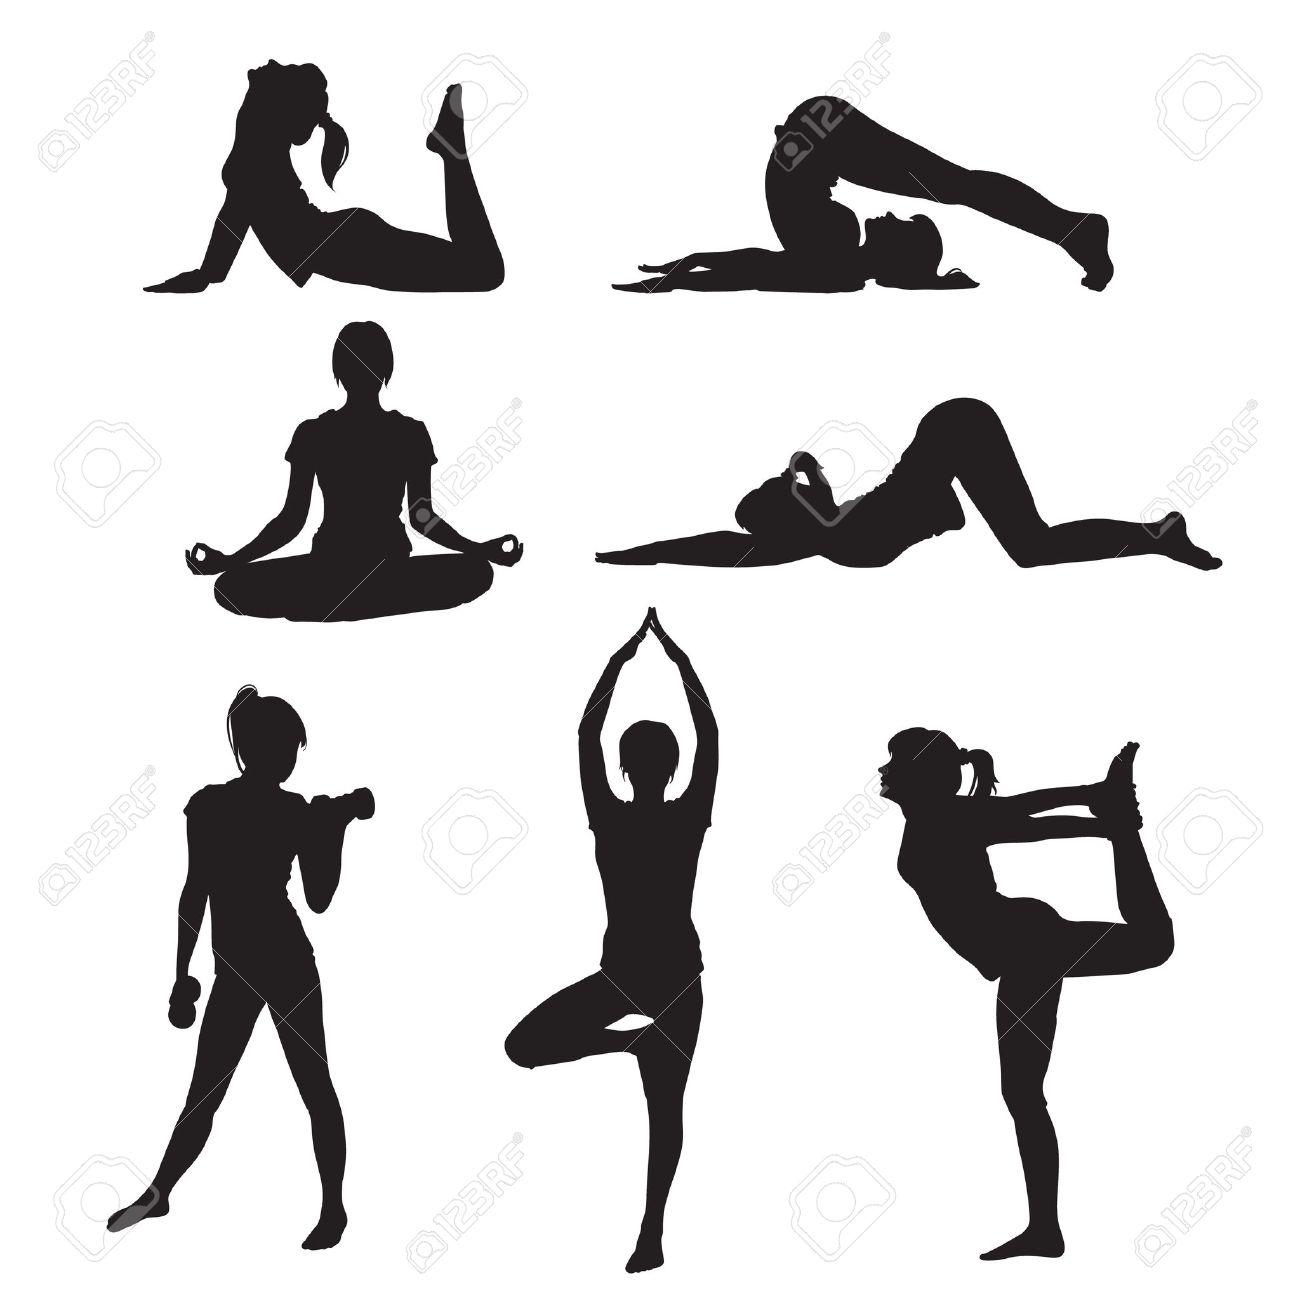 Vector illustration of a girl yoga silhouette - 12496161